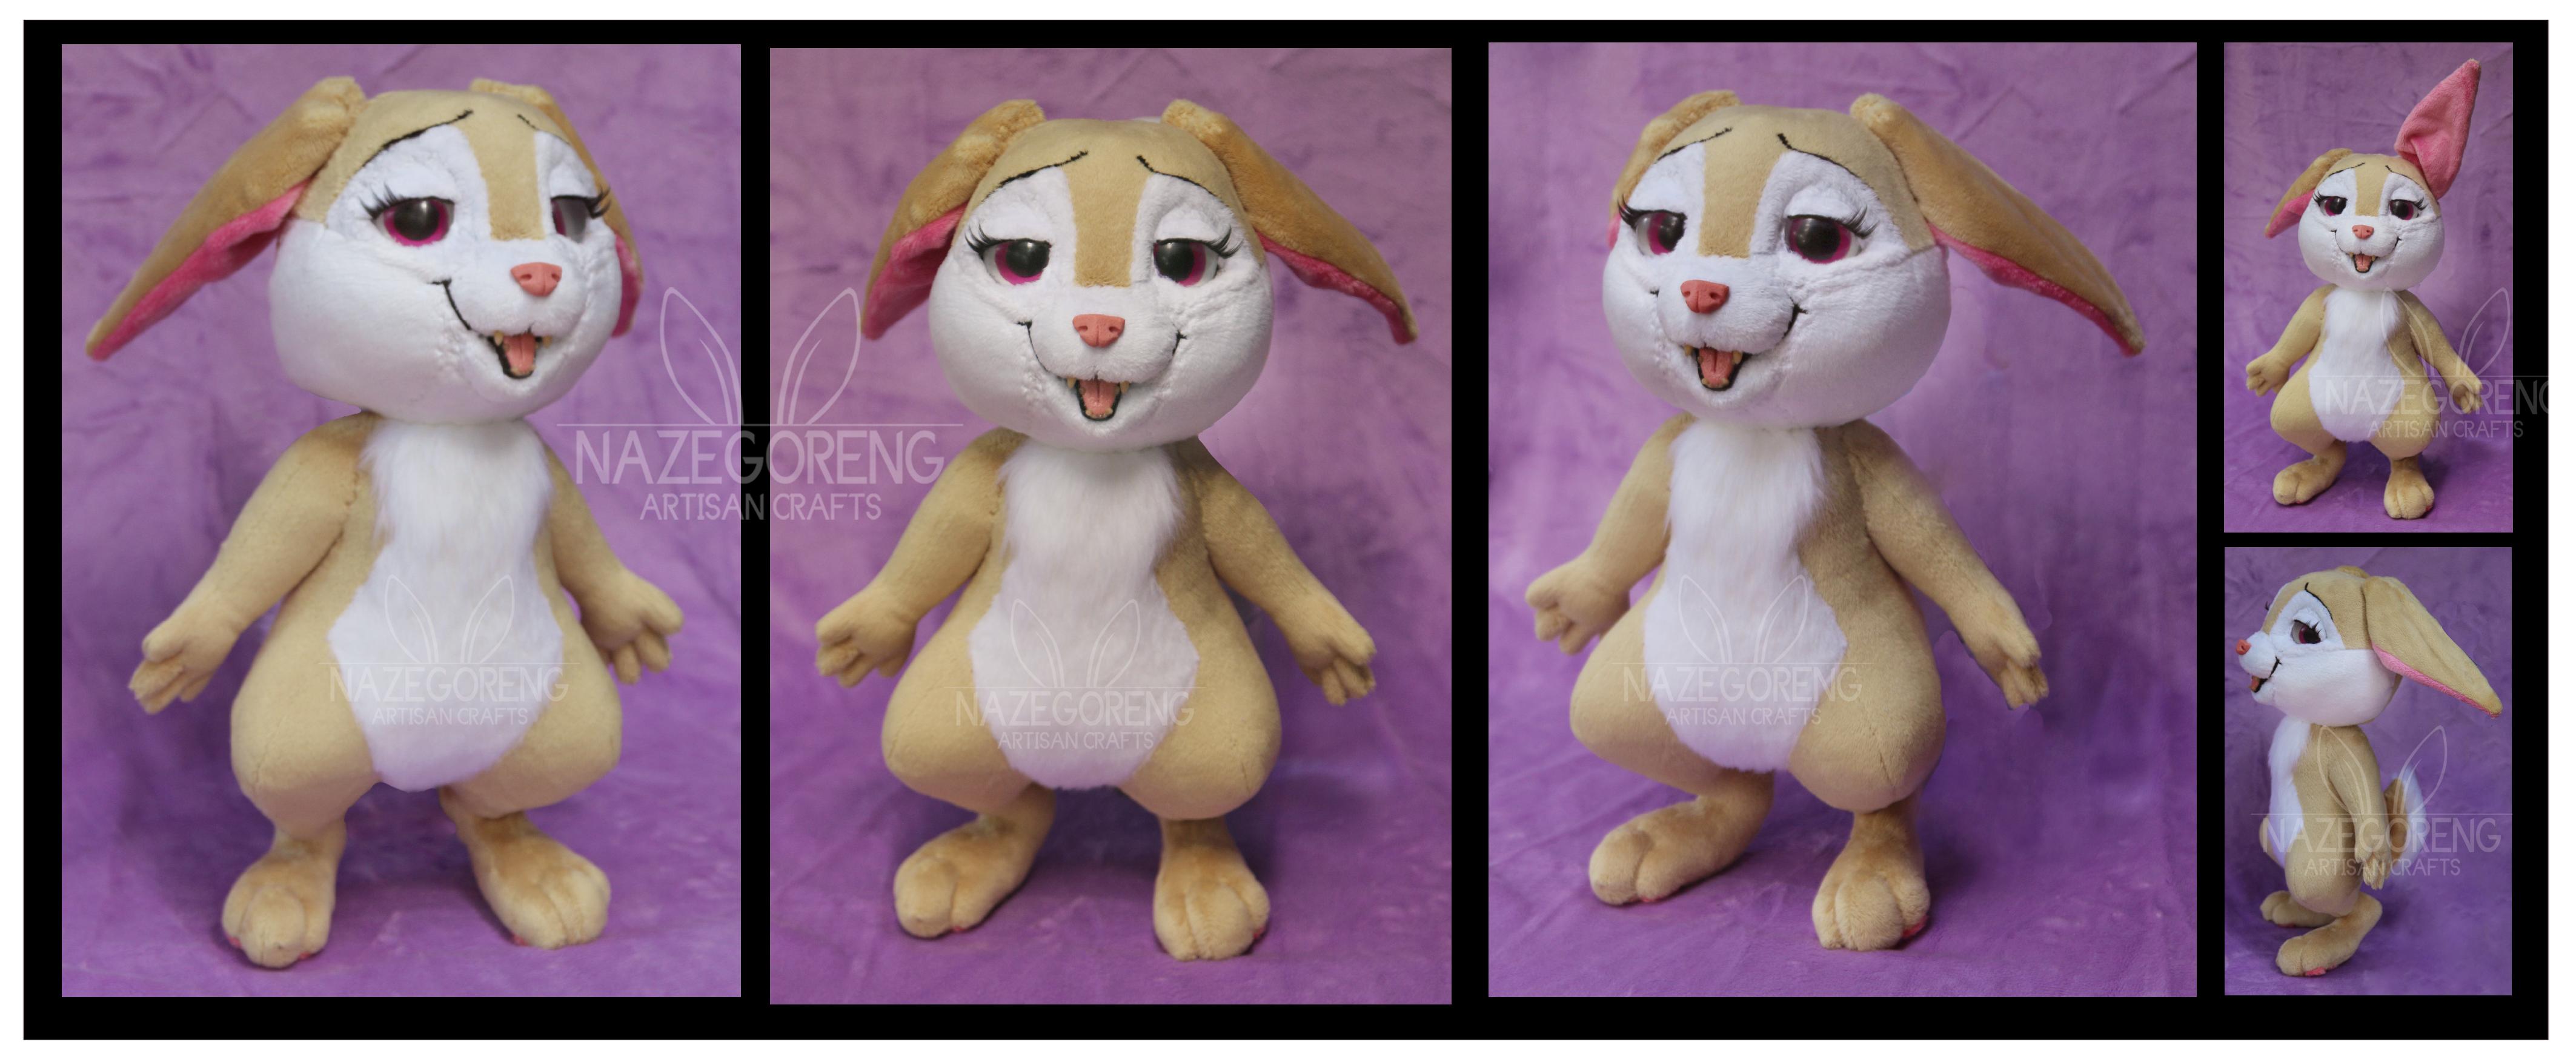 Carrot Bunny Custom Plush by Nazegoreng